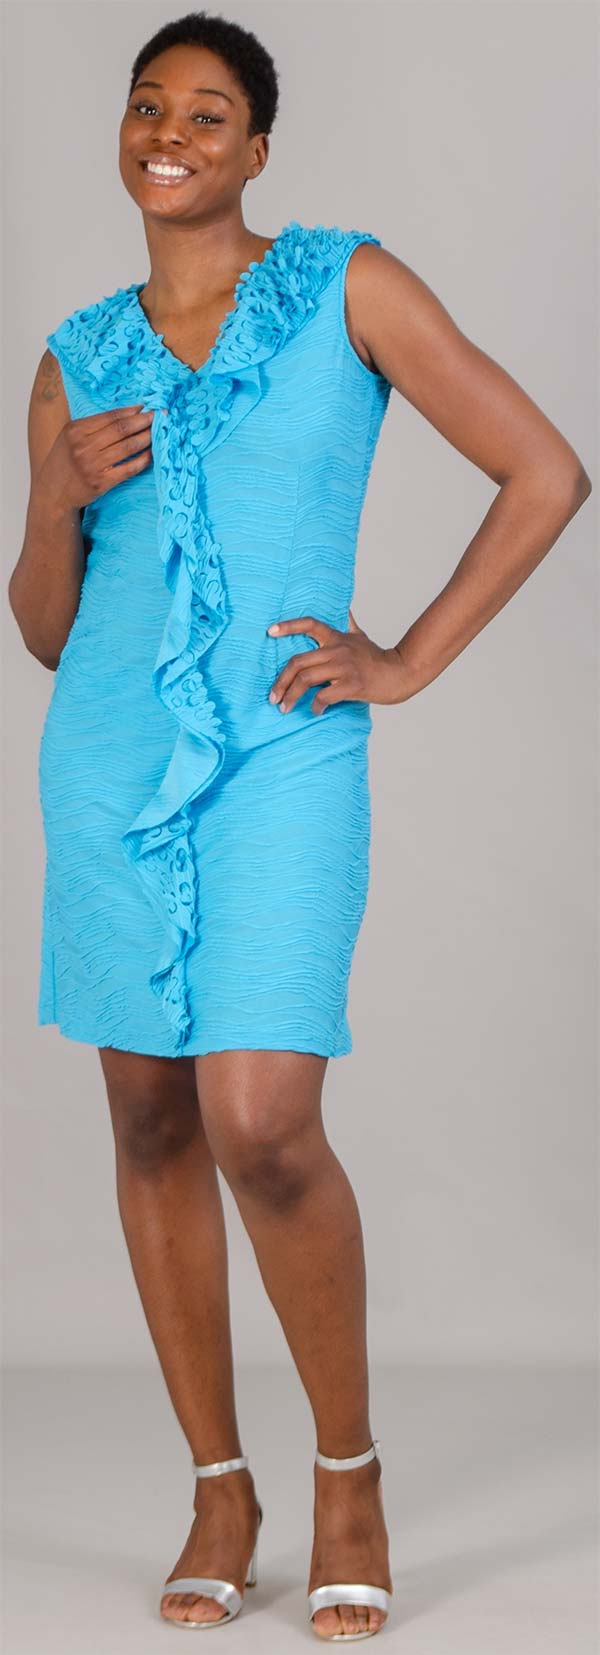 JerryT-SR1562 - Womens Sleeveless Knit Dress With Ruffle Trim Design